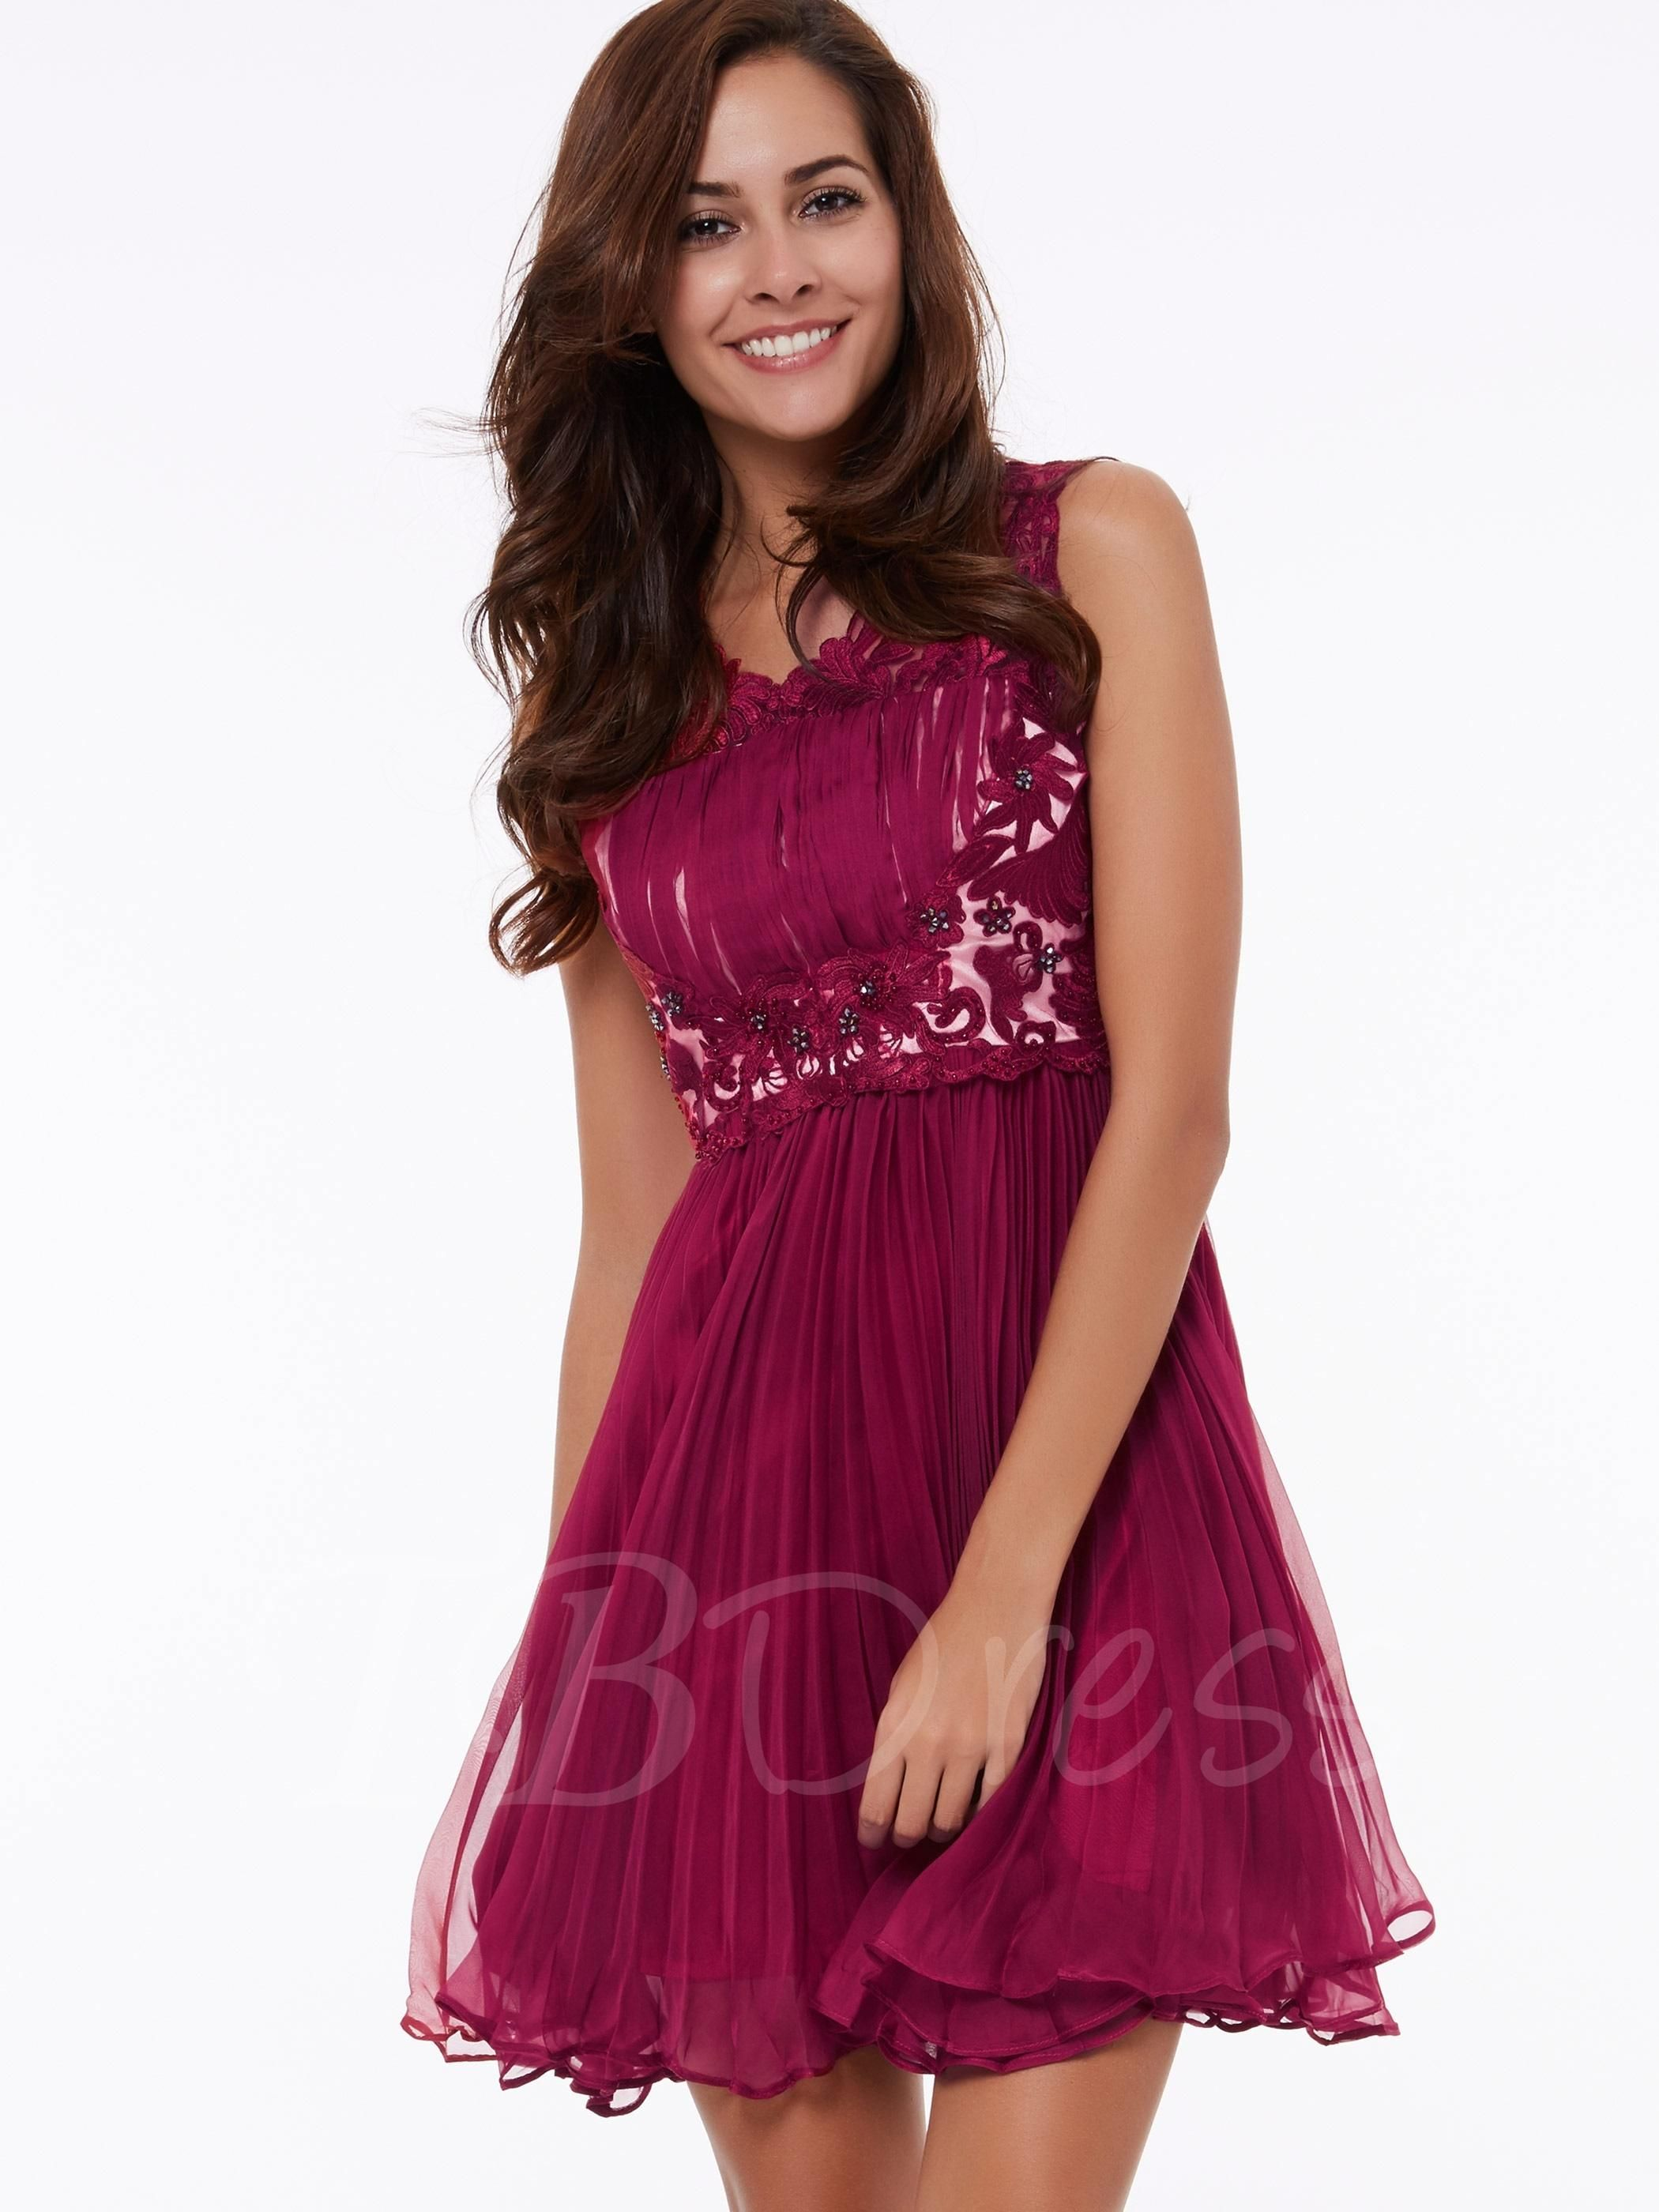 Tbdress tbdress aline scoop beading lace short homecoming dress